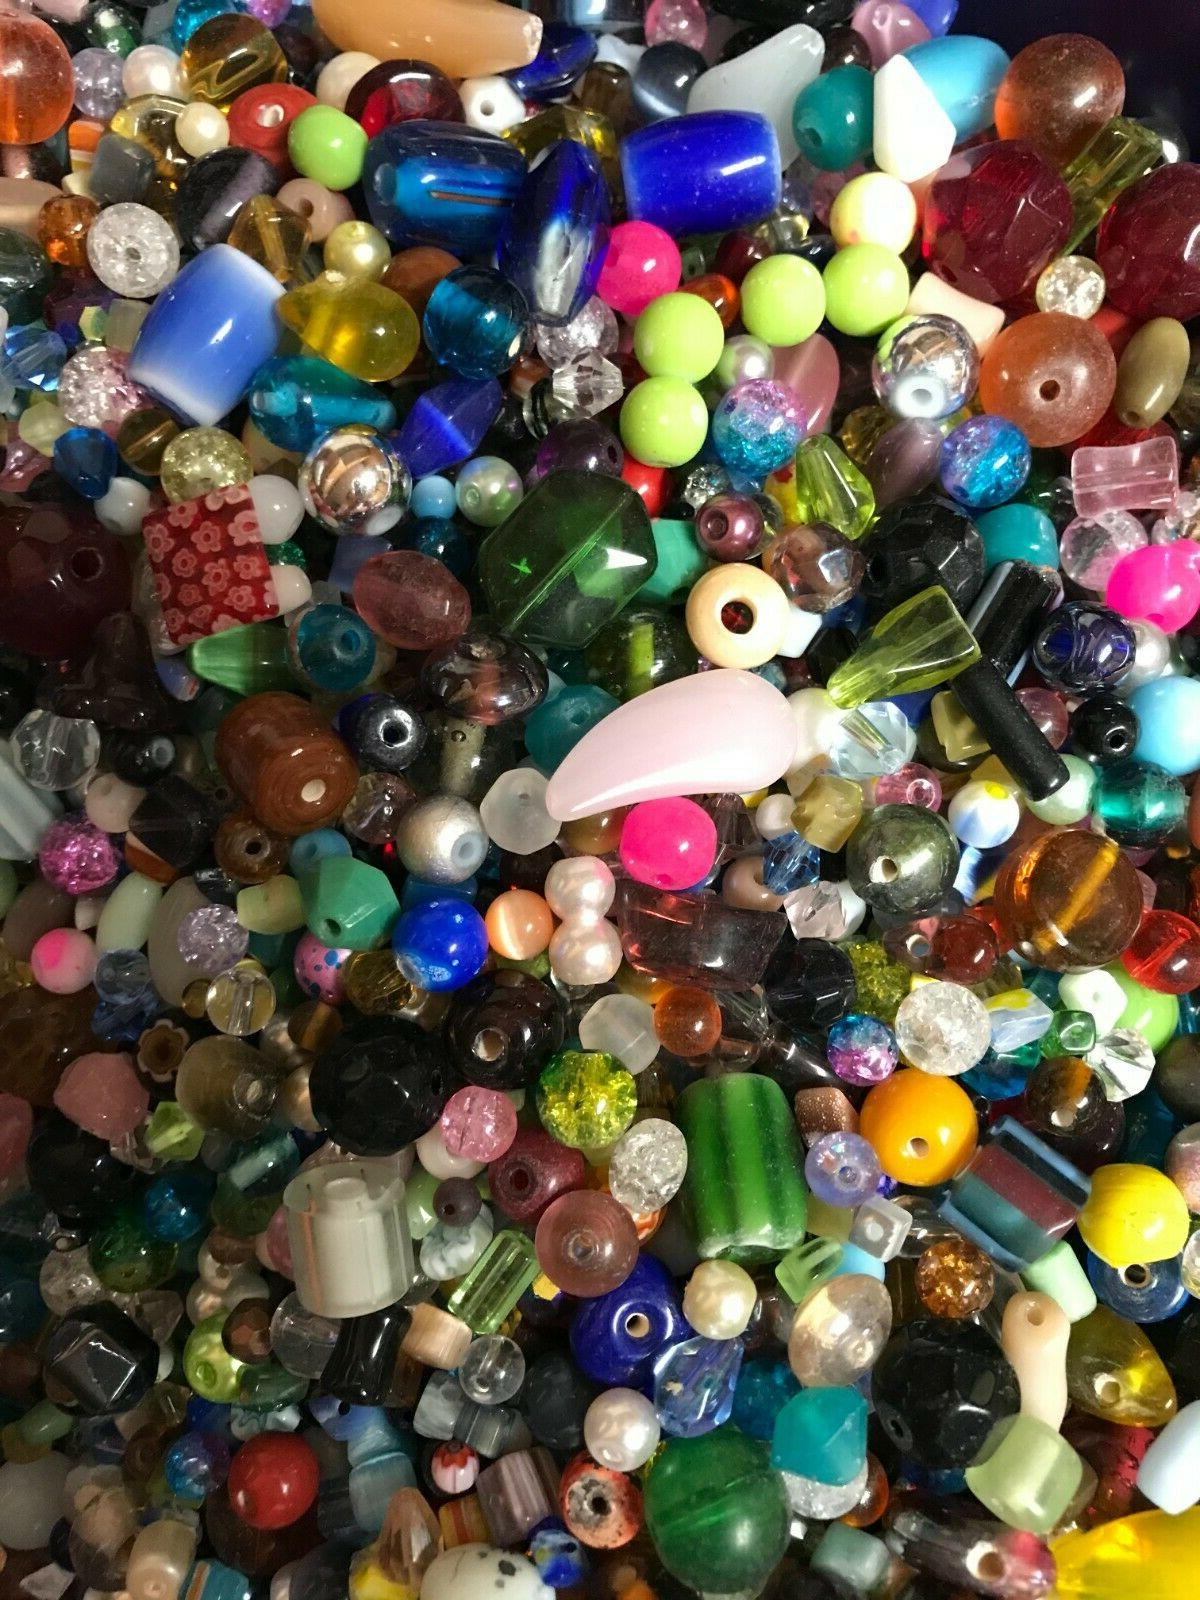 ~100~ Piece Beads Craft Grab Gift*